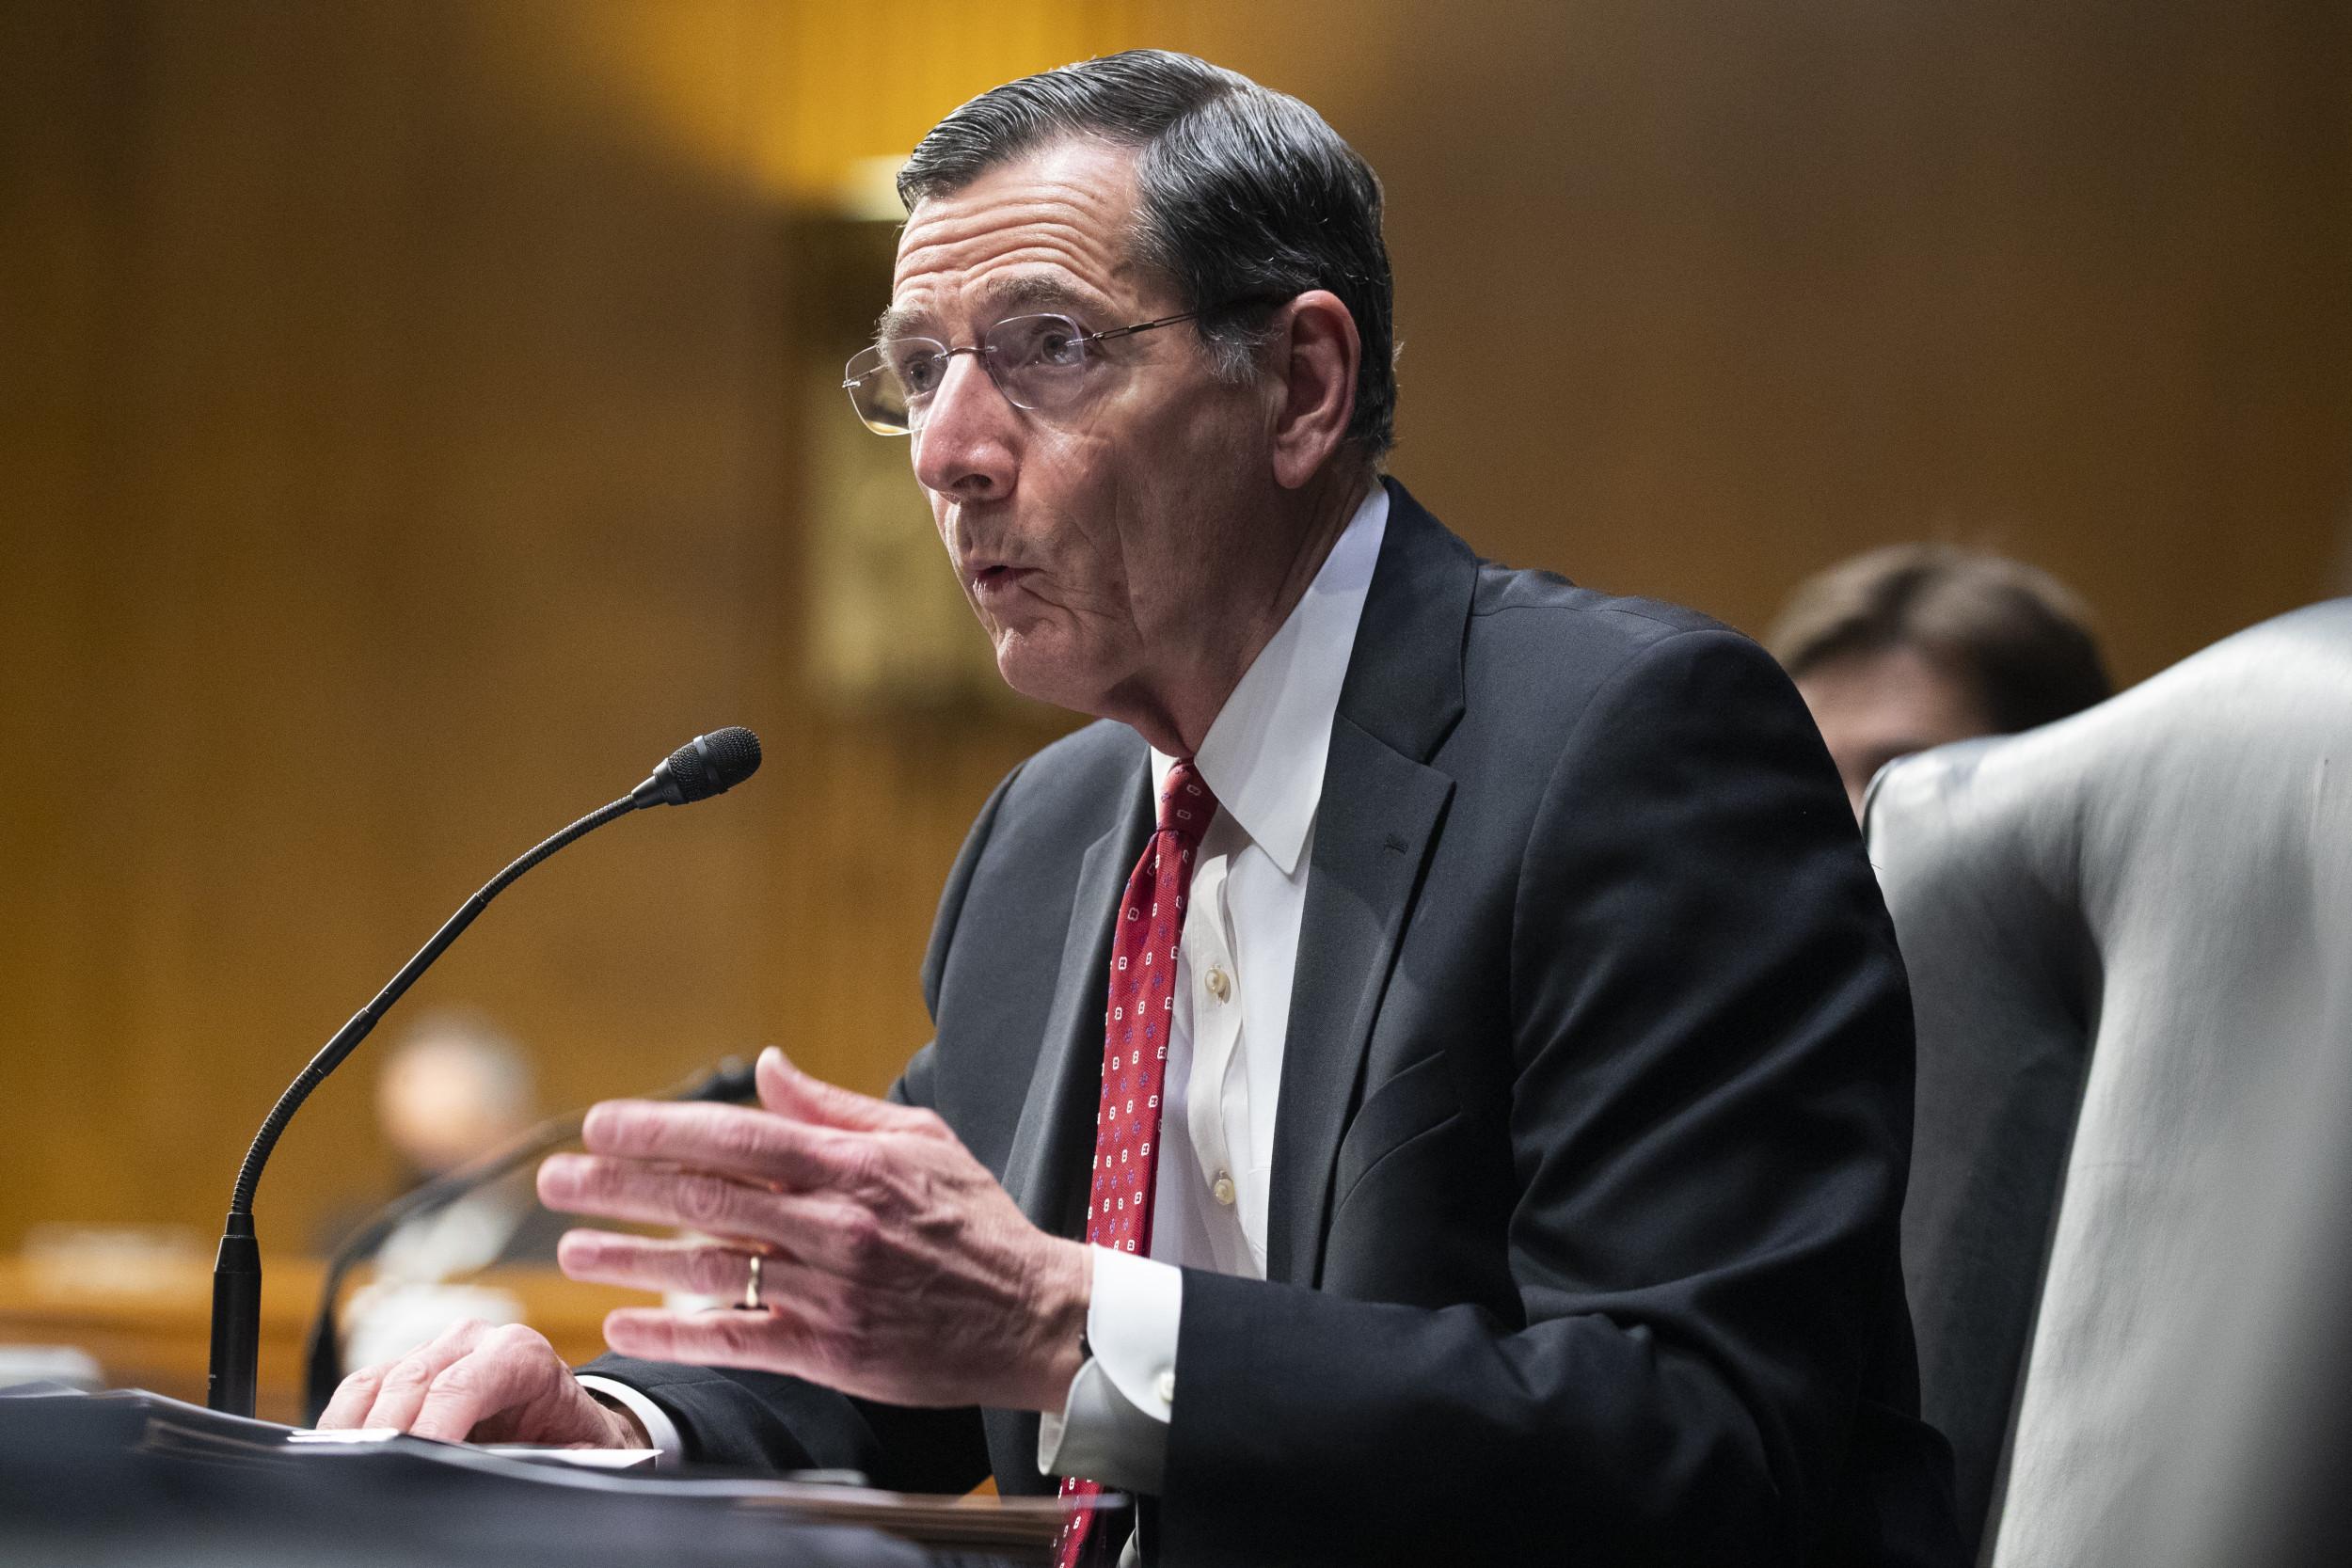 John Barrasso repeats Ted Cruz claim stimulus checks will go to illegal immigrants